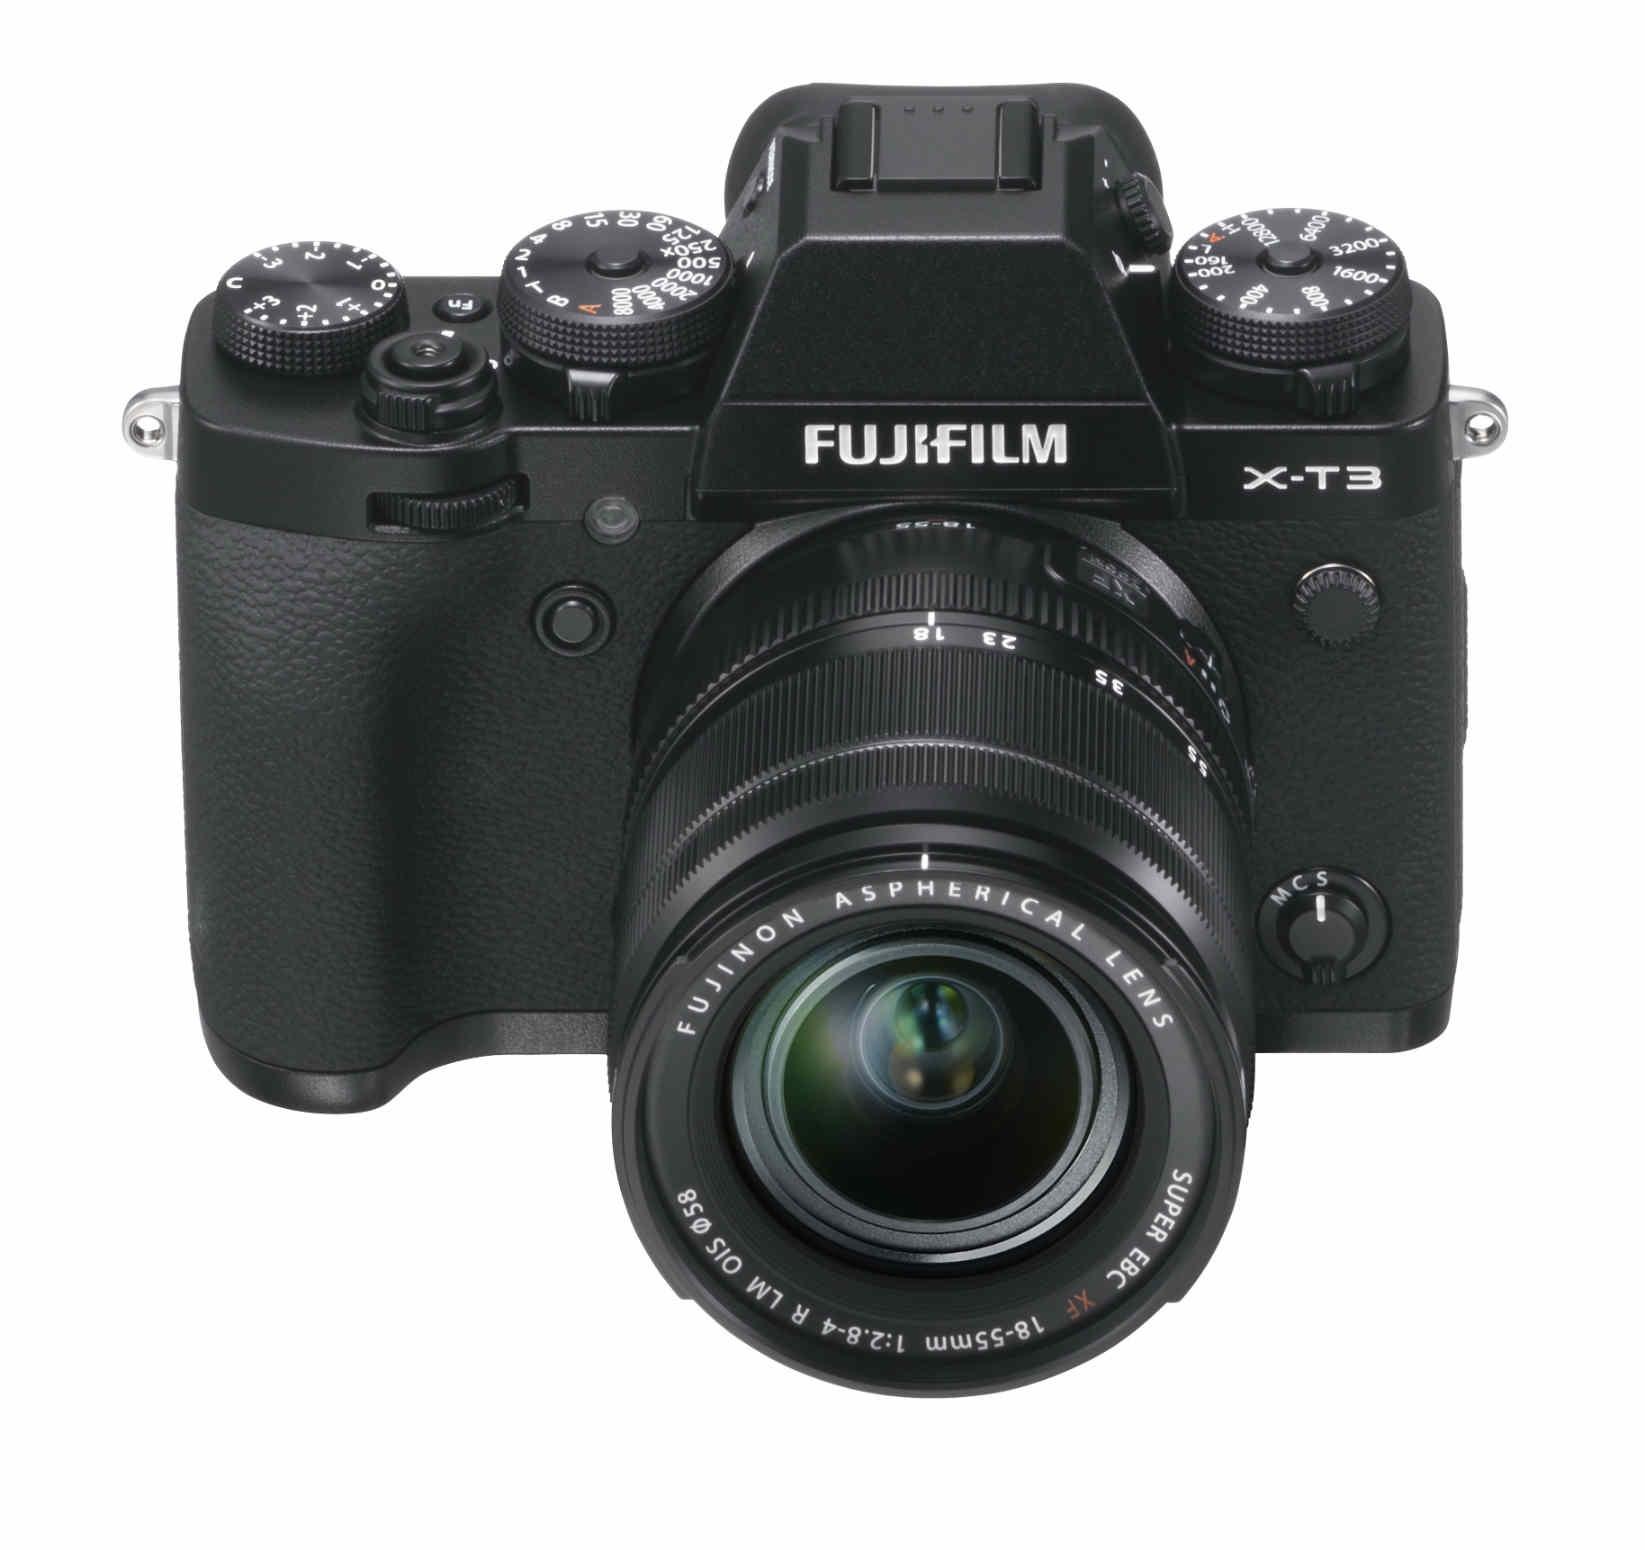 FujiFilm 2GB SD Scheda Di Memoria per Ricoh Caplio G3 Fotocamera digitale